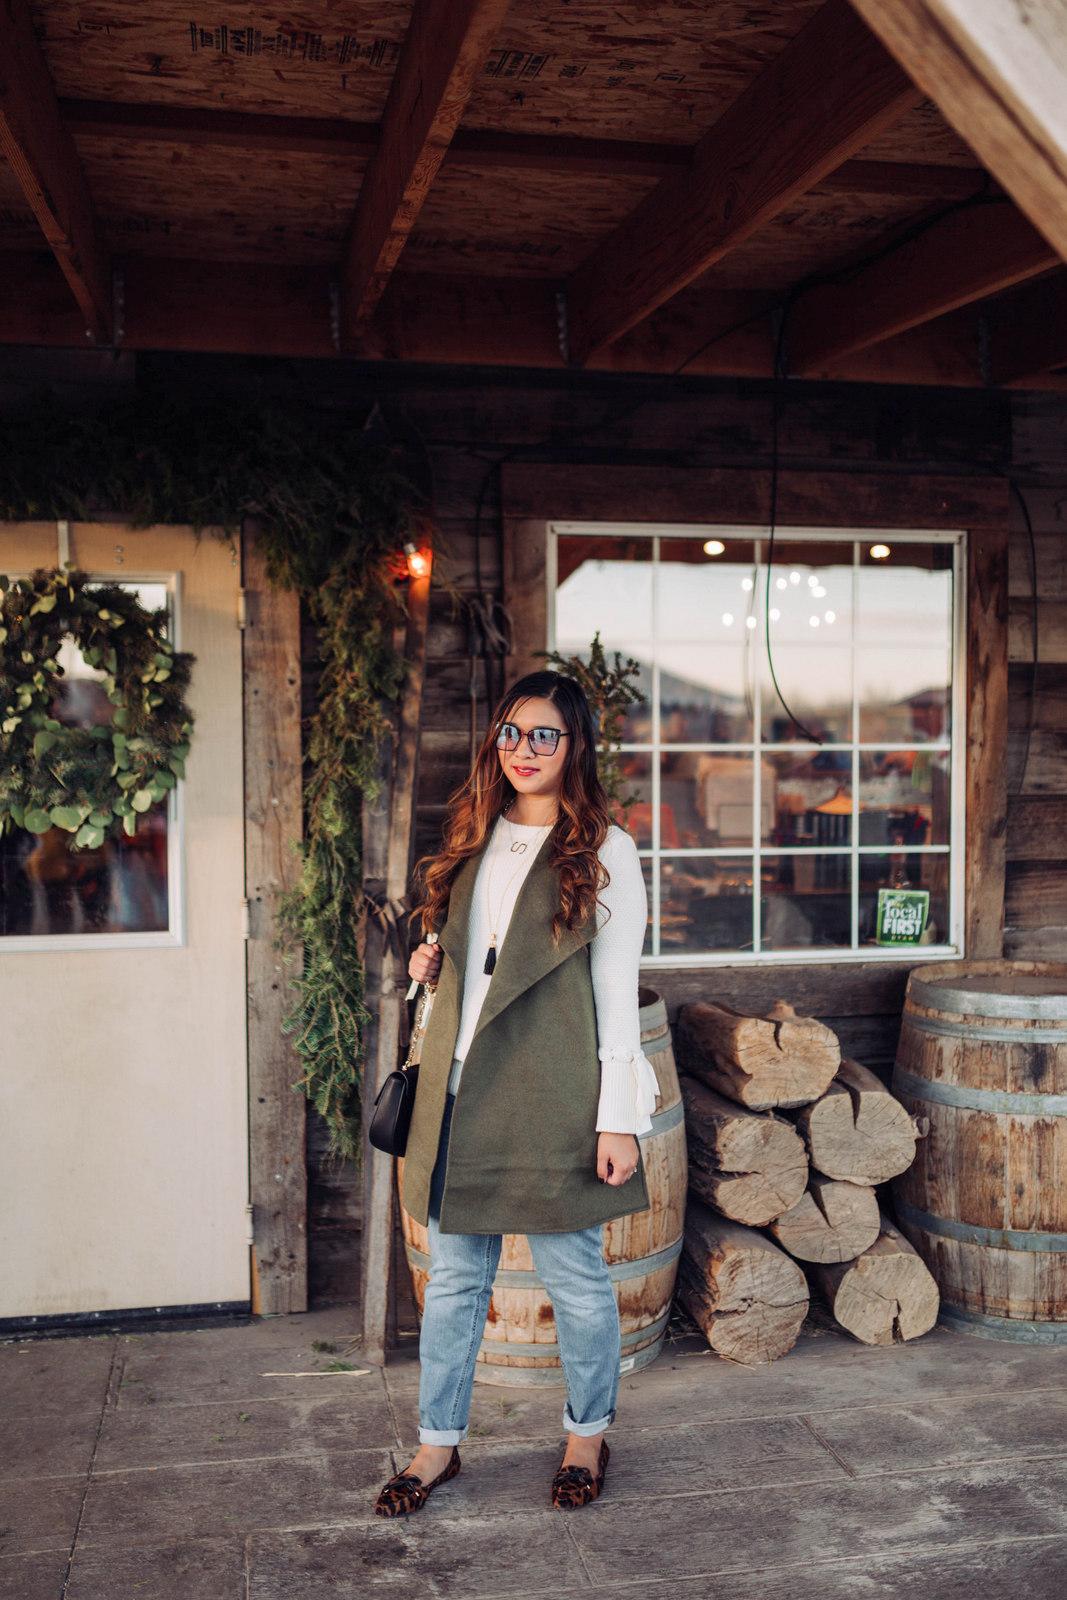 Modern Lady - Because I am A Lady by Utah lifestyle blogger Sandy A La Mode